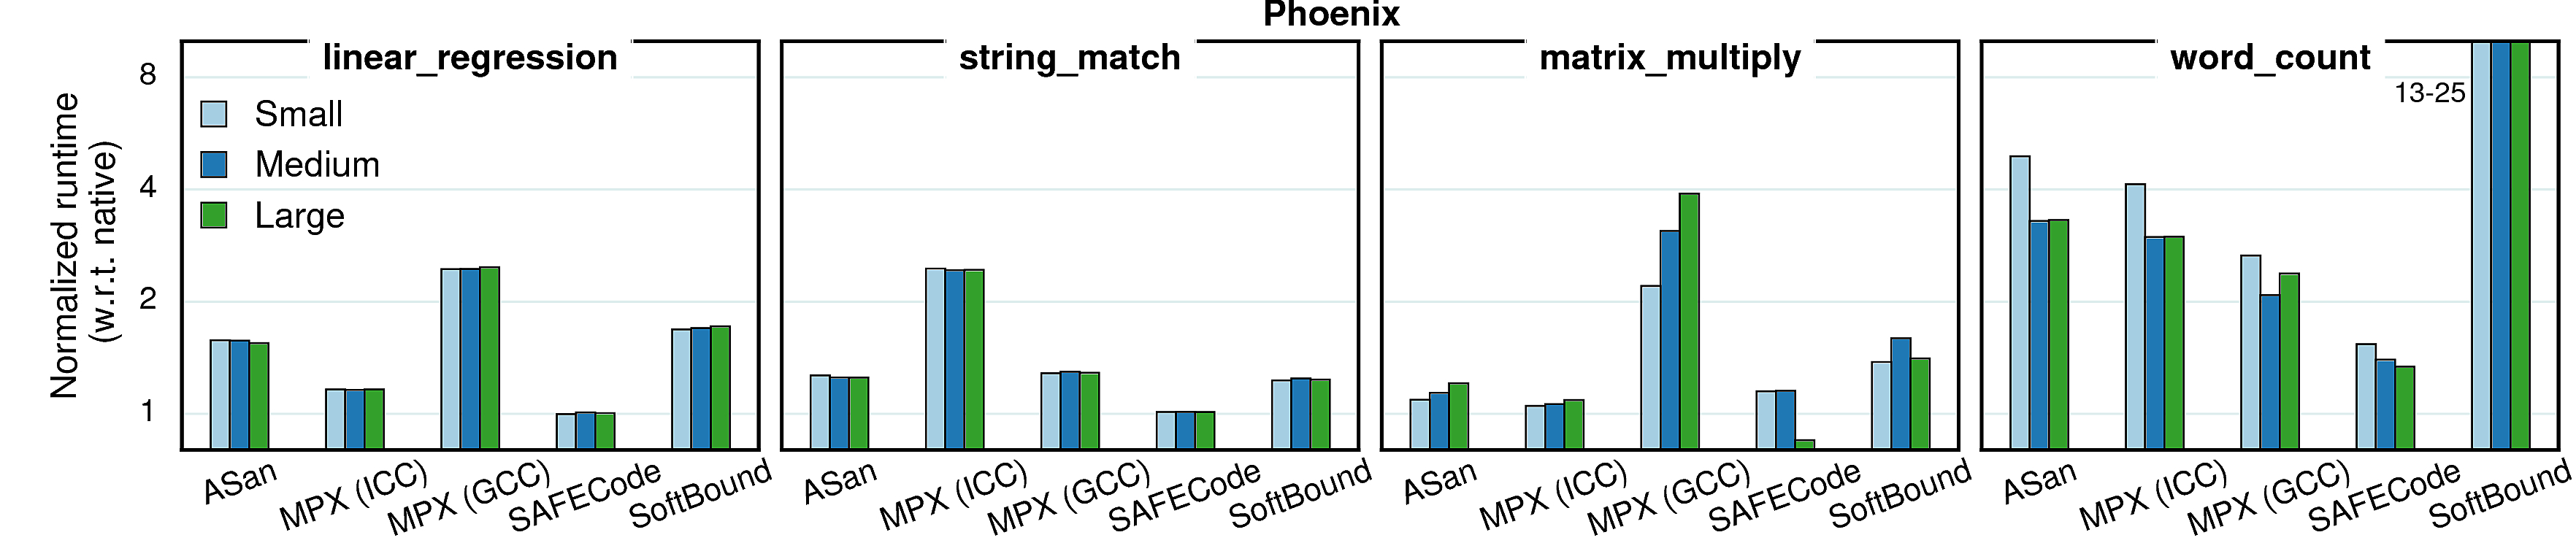 Varying inputs - performance (Phoenix)